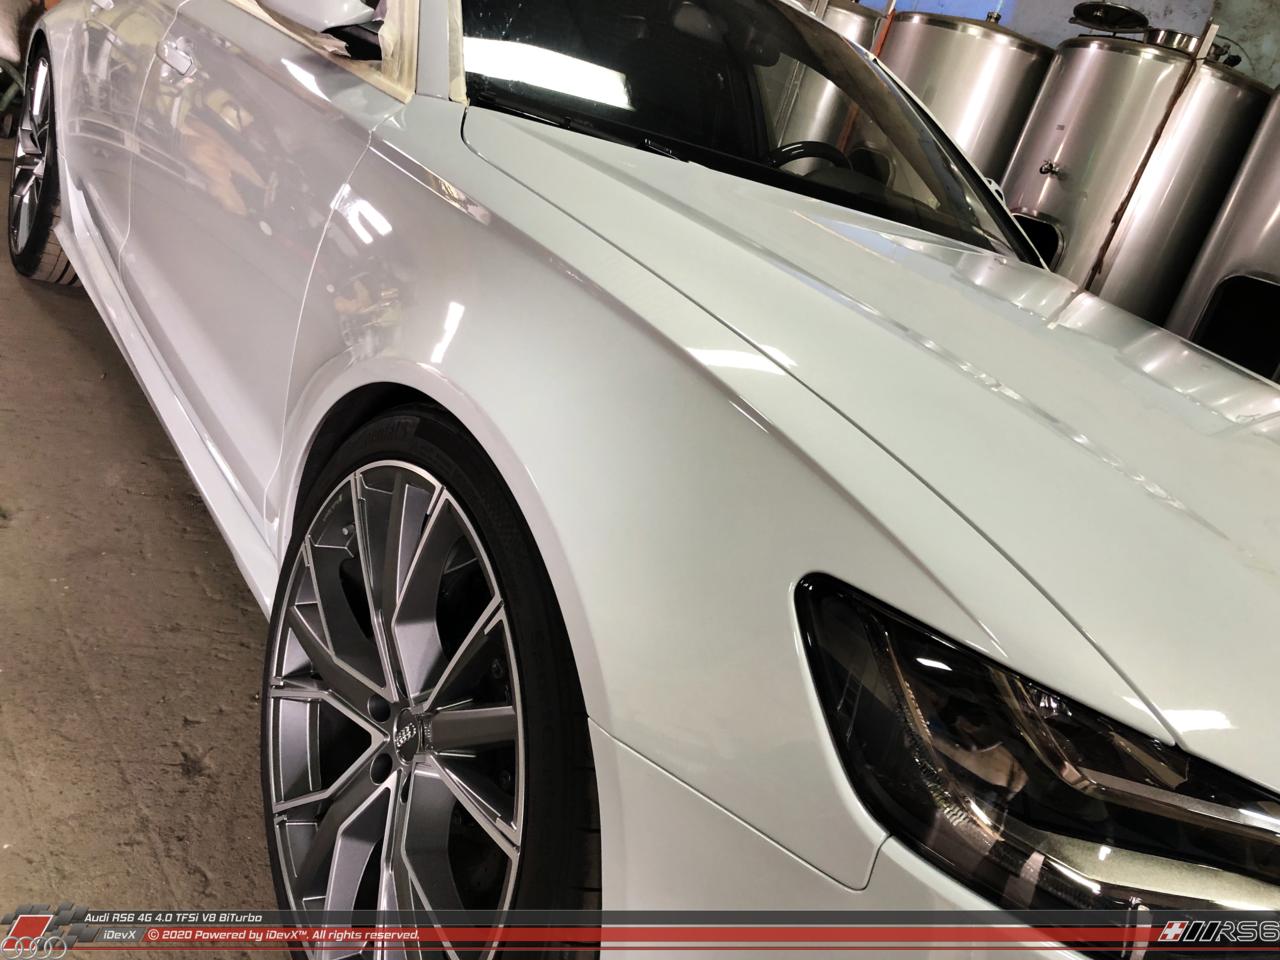 05_08.2019_Audi-RS6_iDevX_029.png